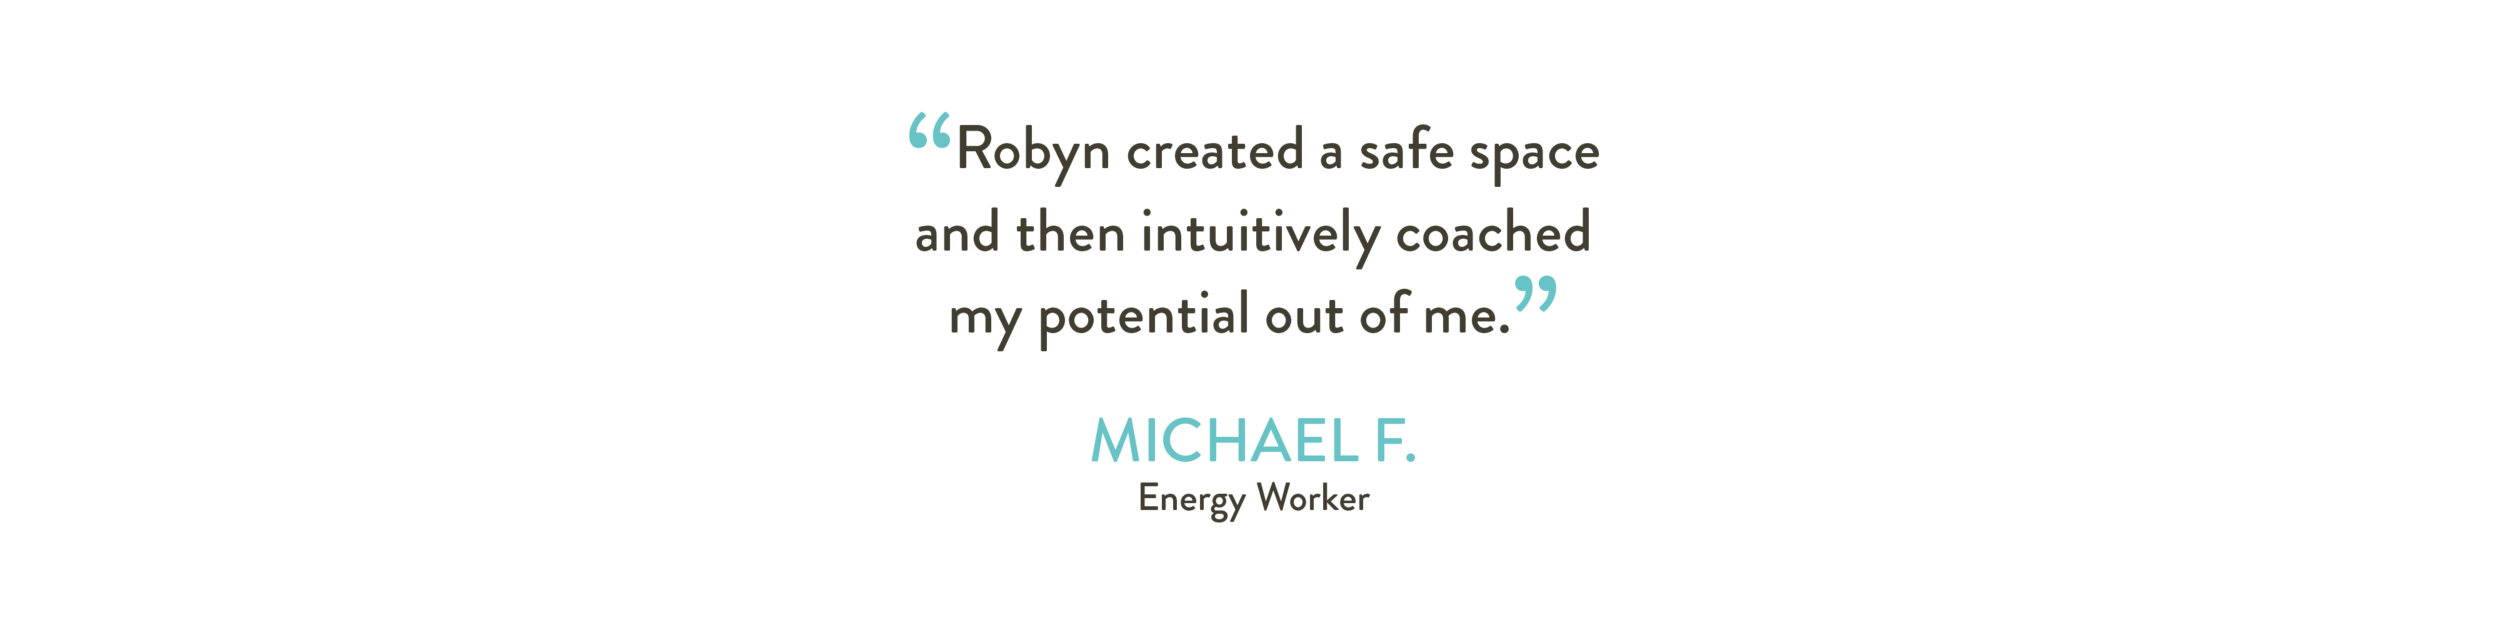 7_RLS_Testimonials_Coach_Michael F.png